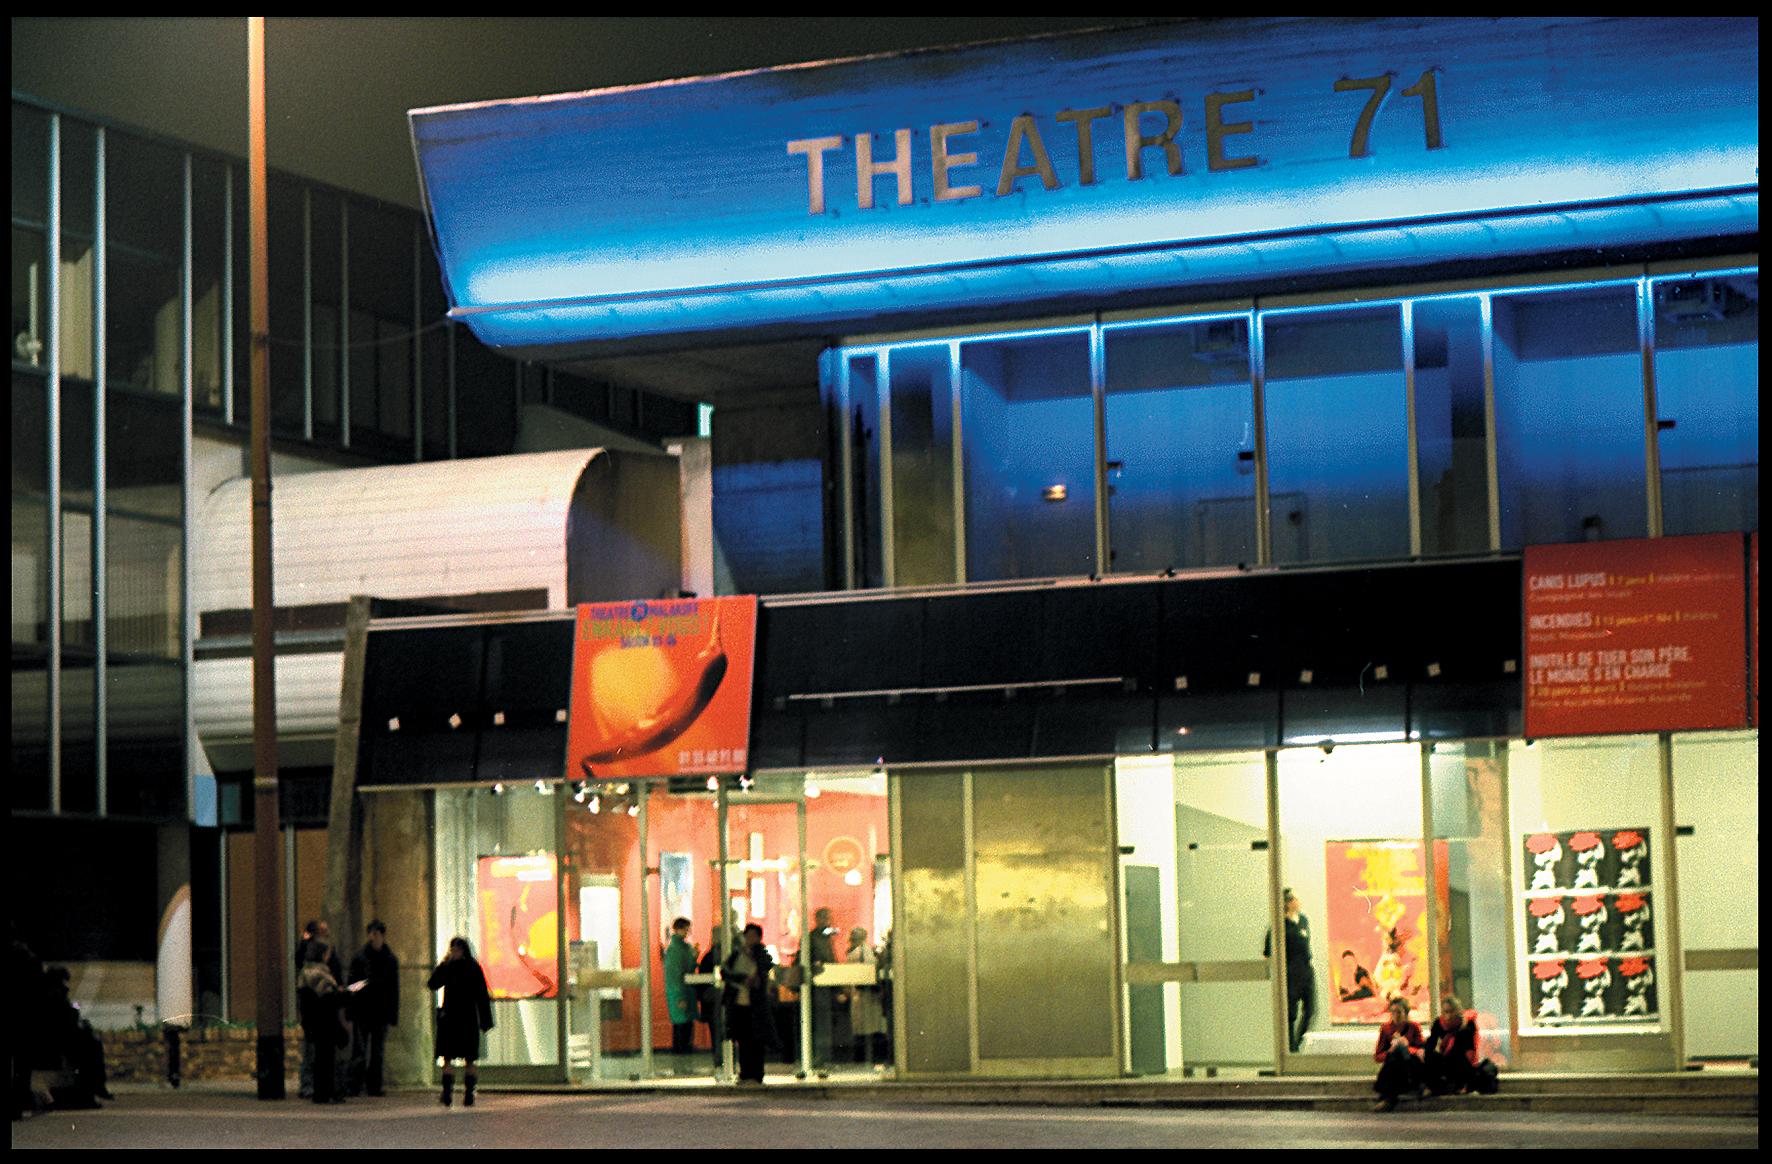 Malakoff • Théâtre 71